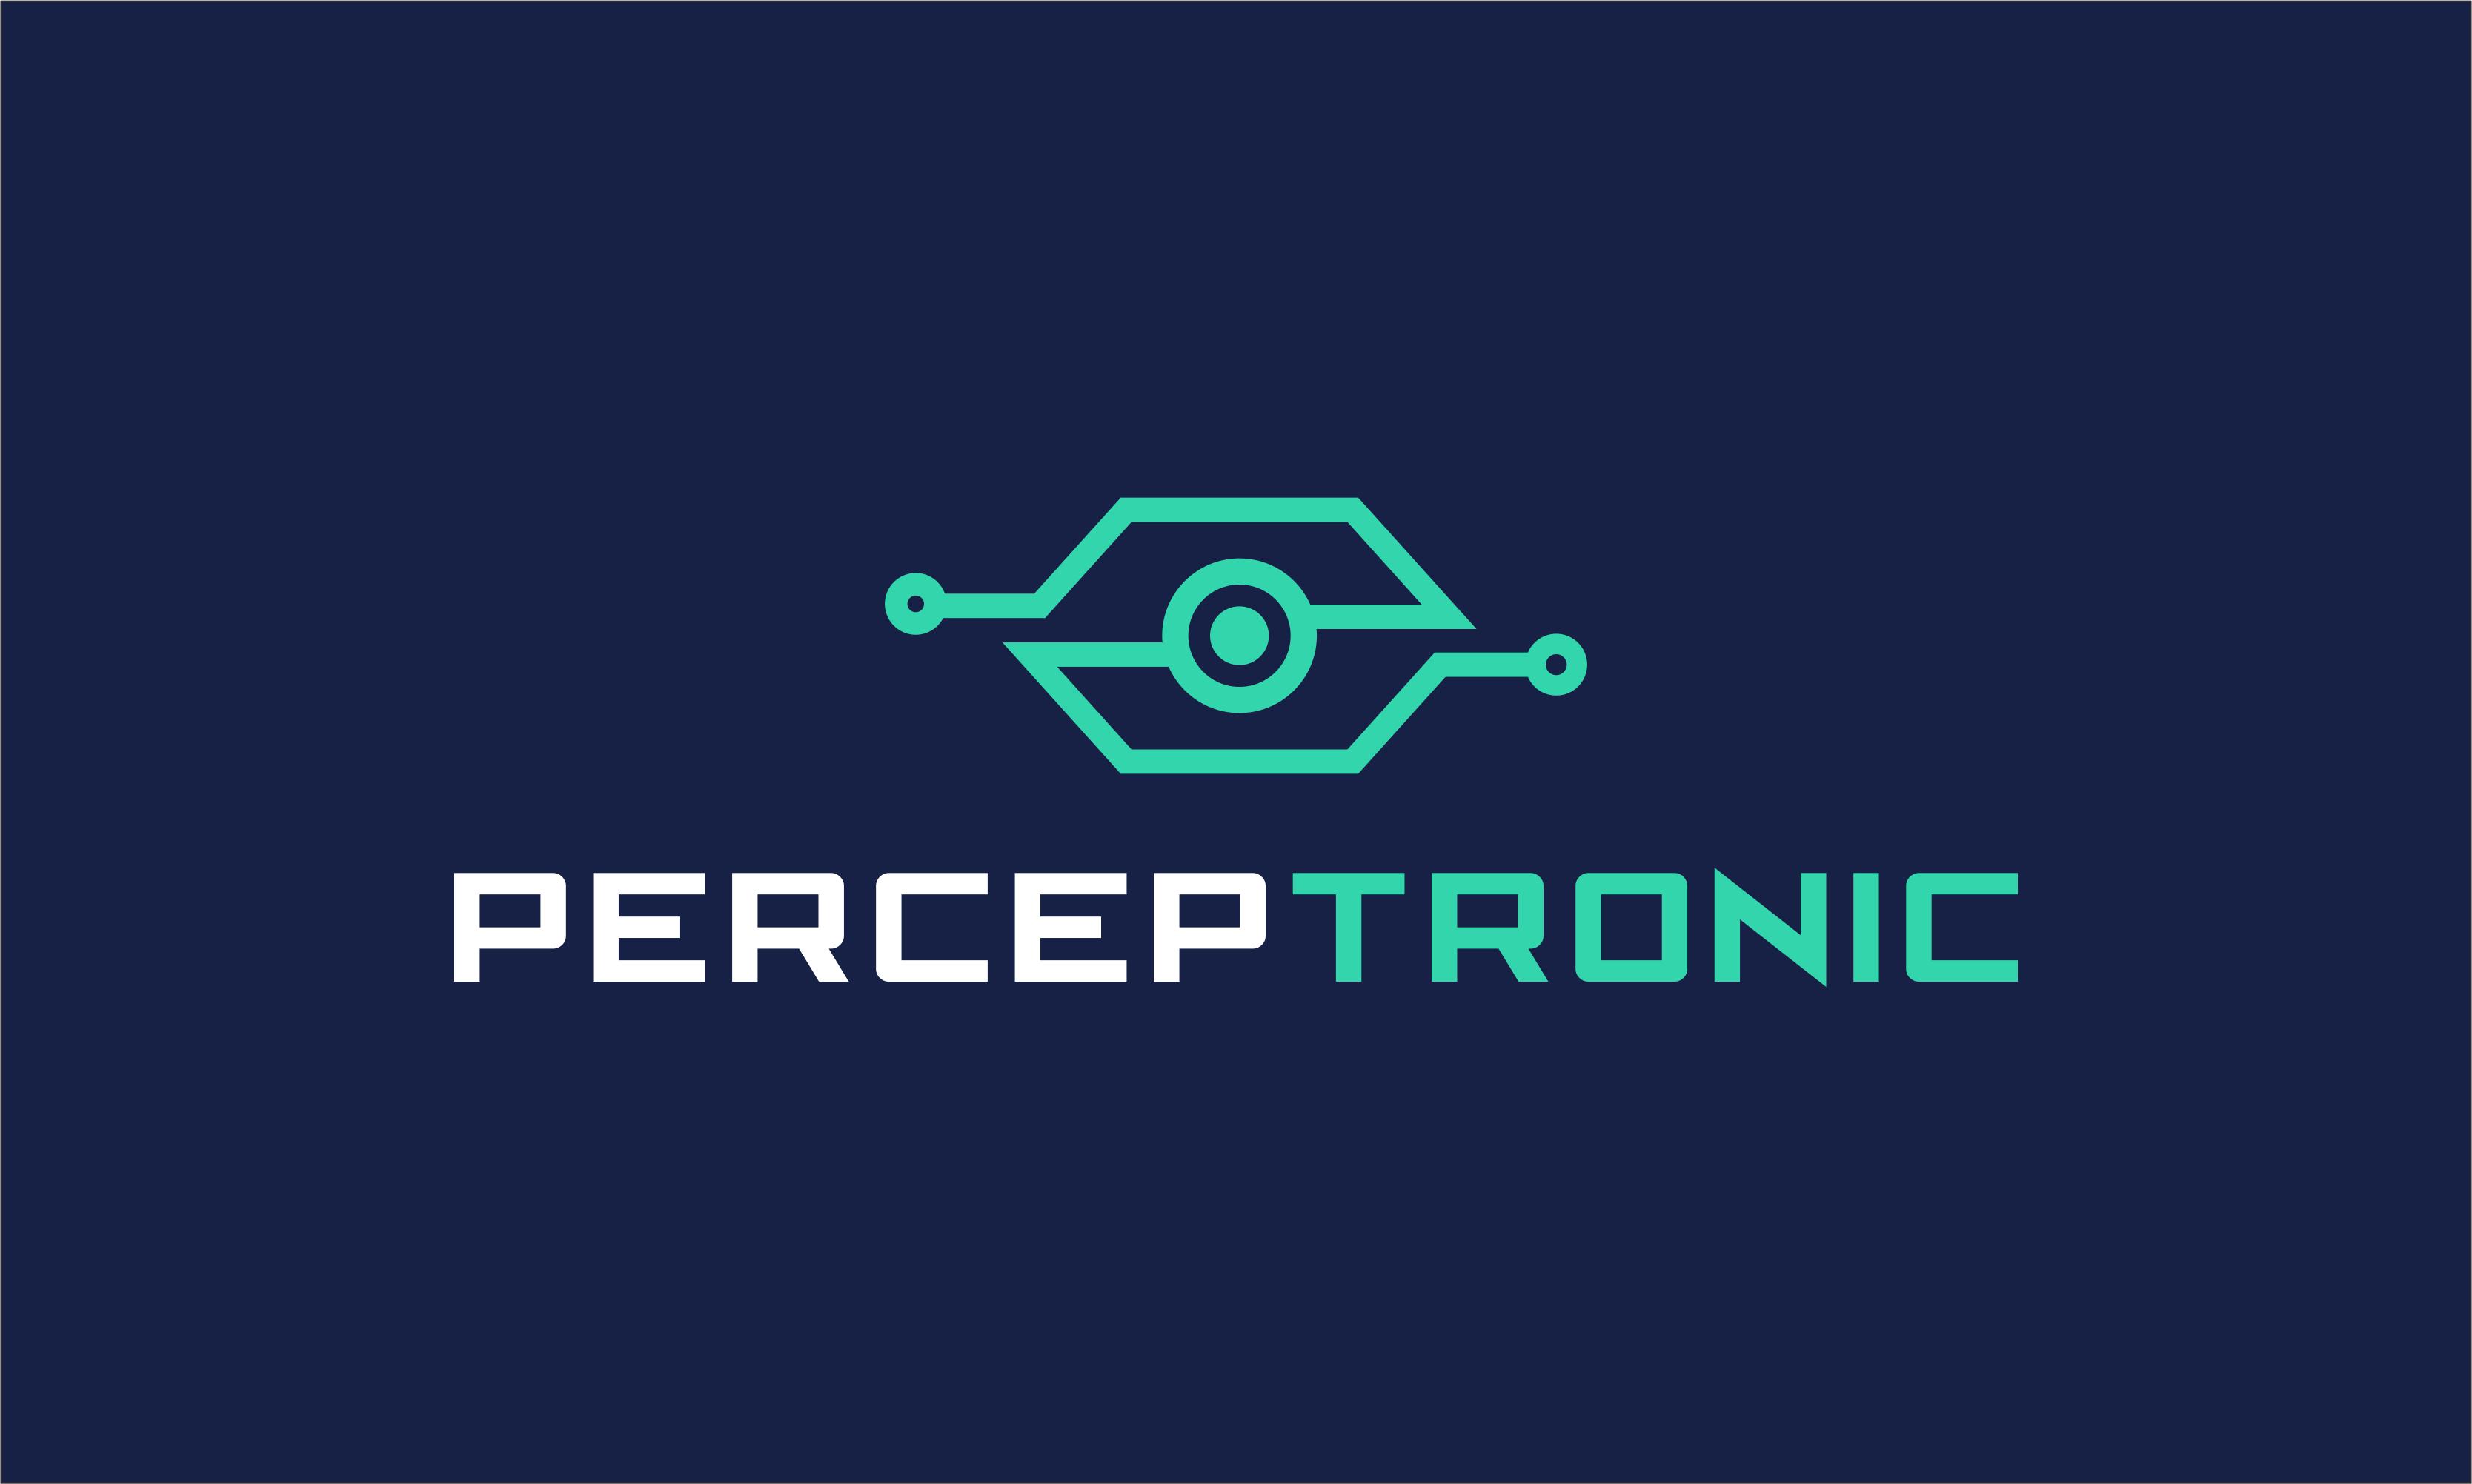 Perceptronic